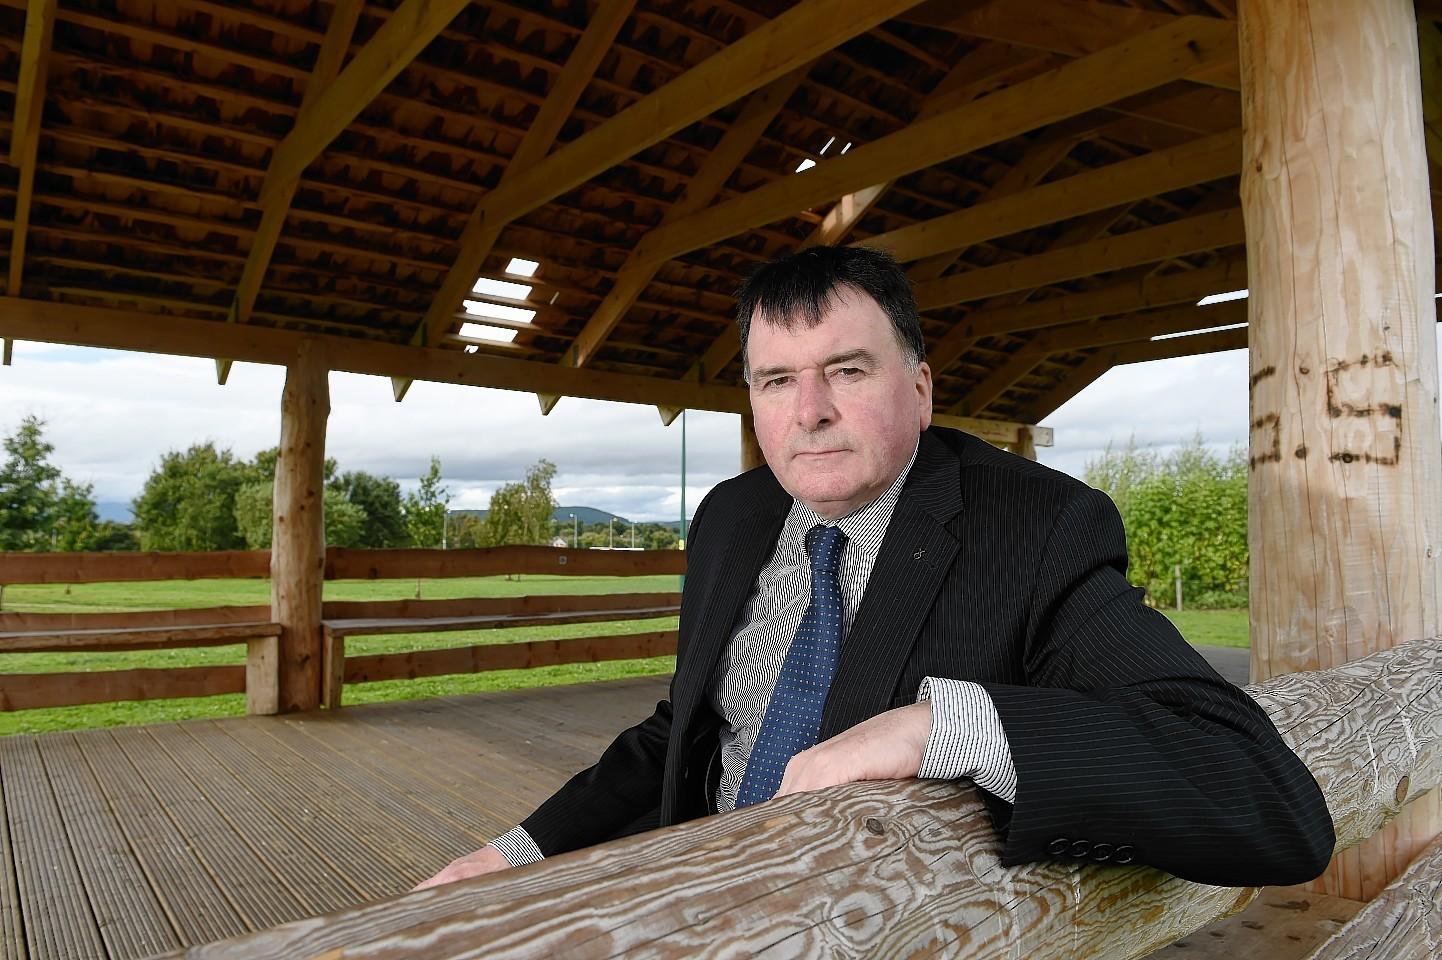 Highland Councillor Ken Gowans in the vandalised pavilion in Inshes Park